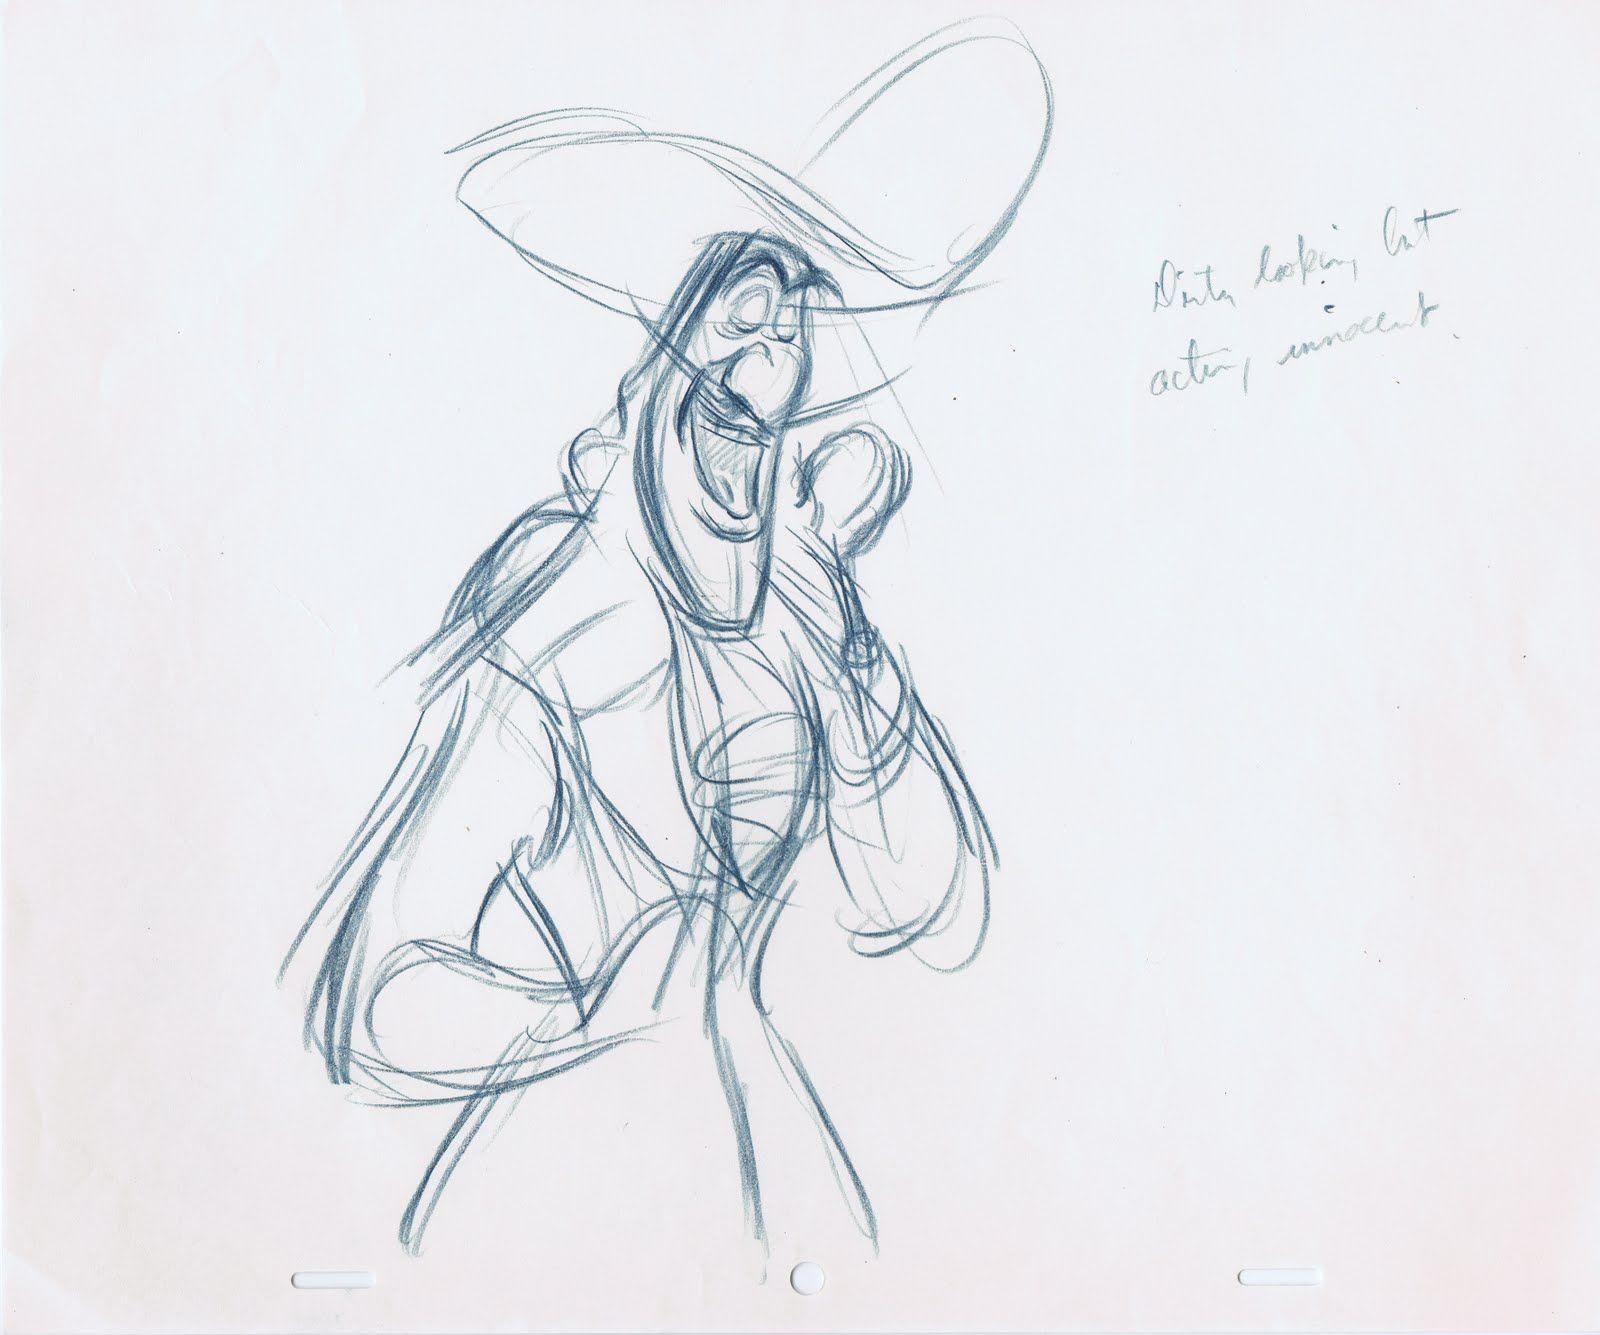 Drawing of Captain Hook by: Frank Thomas (via Deja View)